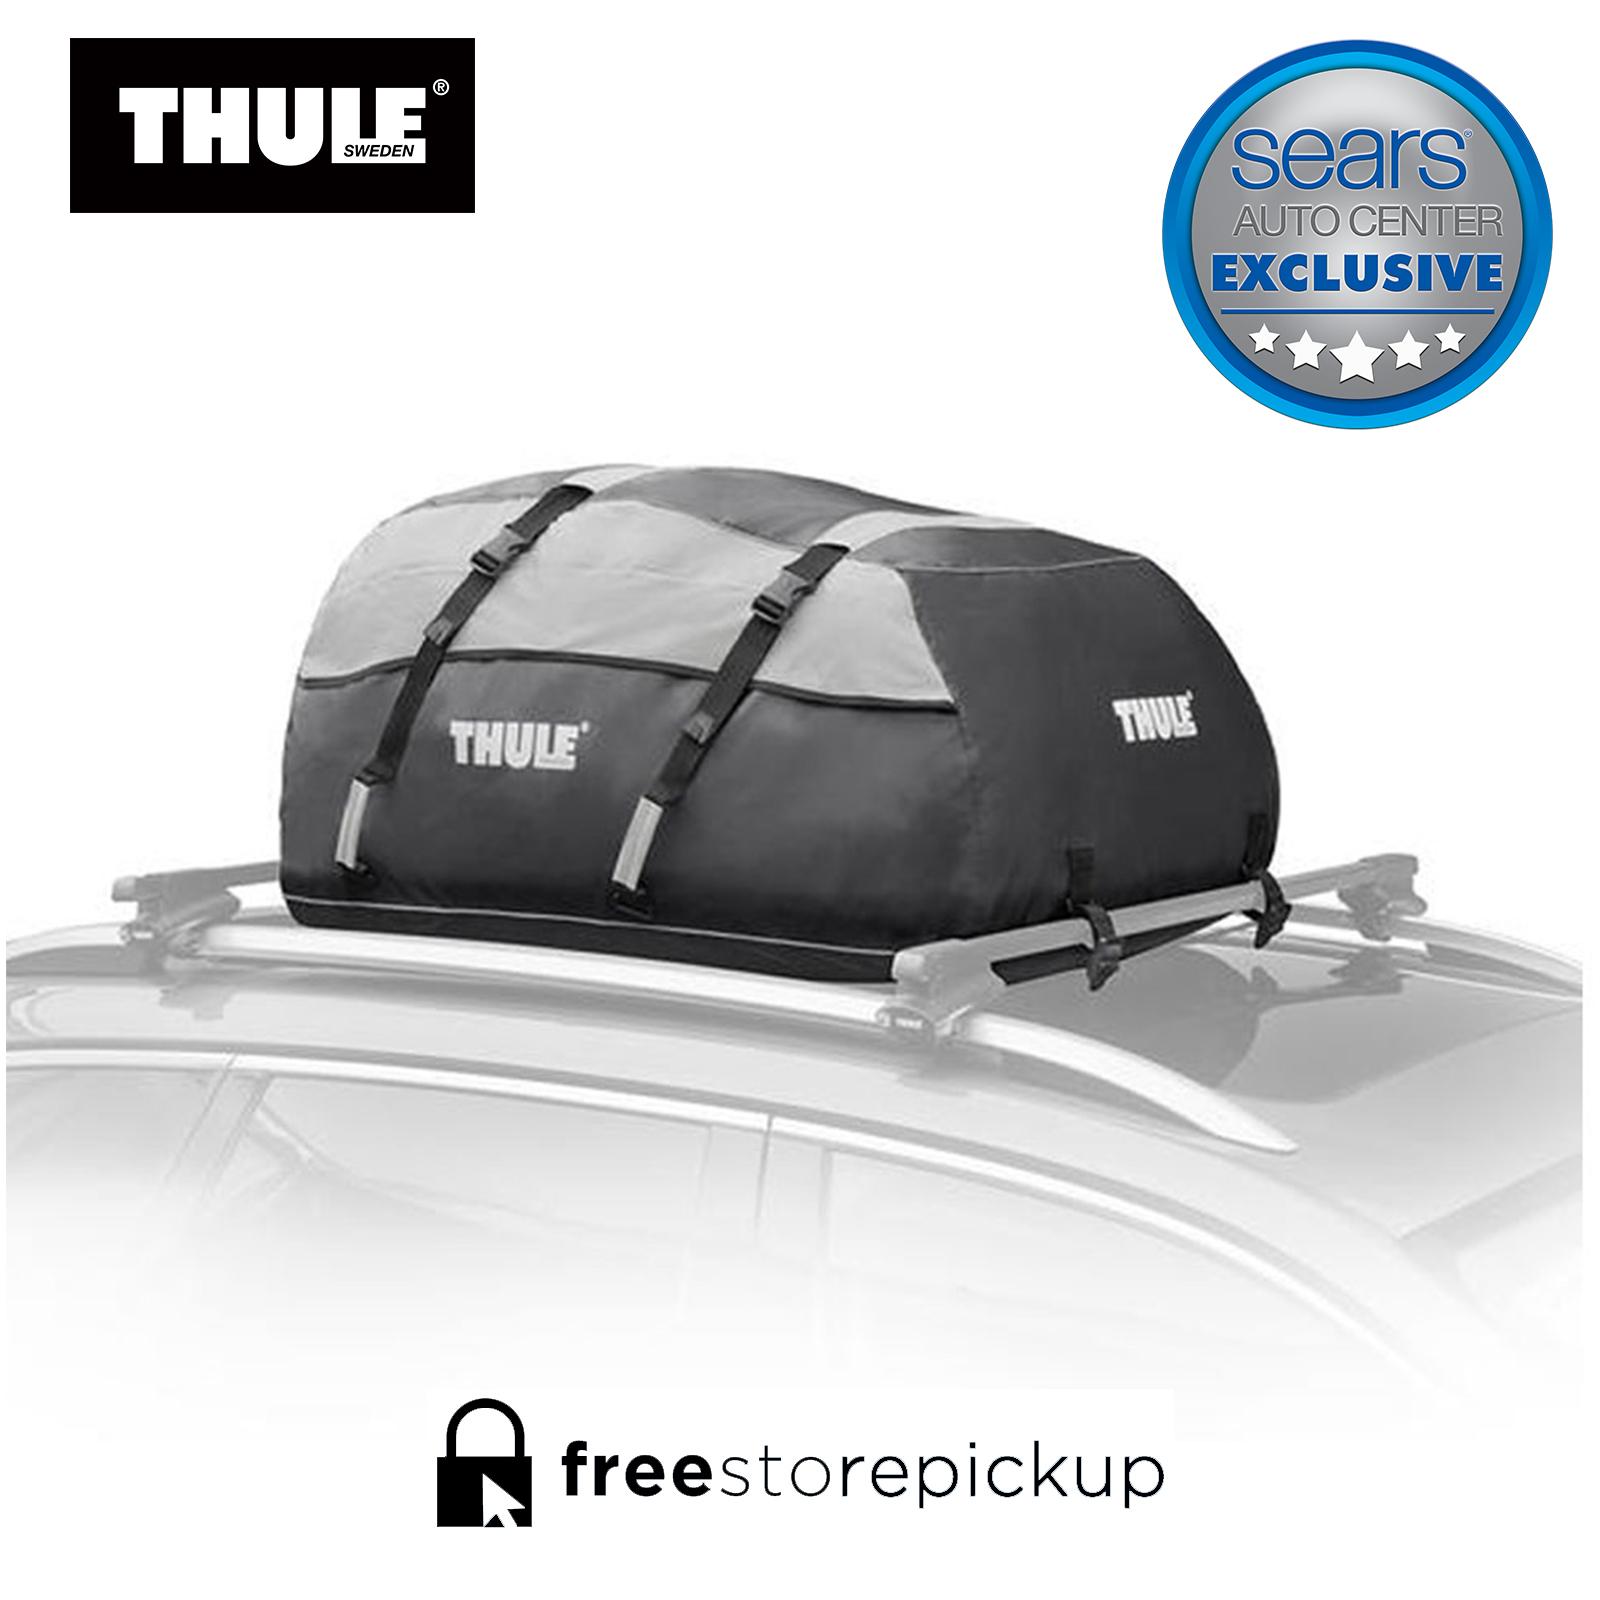 Thule Thule 15XT Luggage Loft Black 858 15 Cu. Ft. Cargo Bag